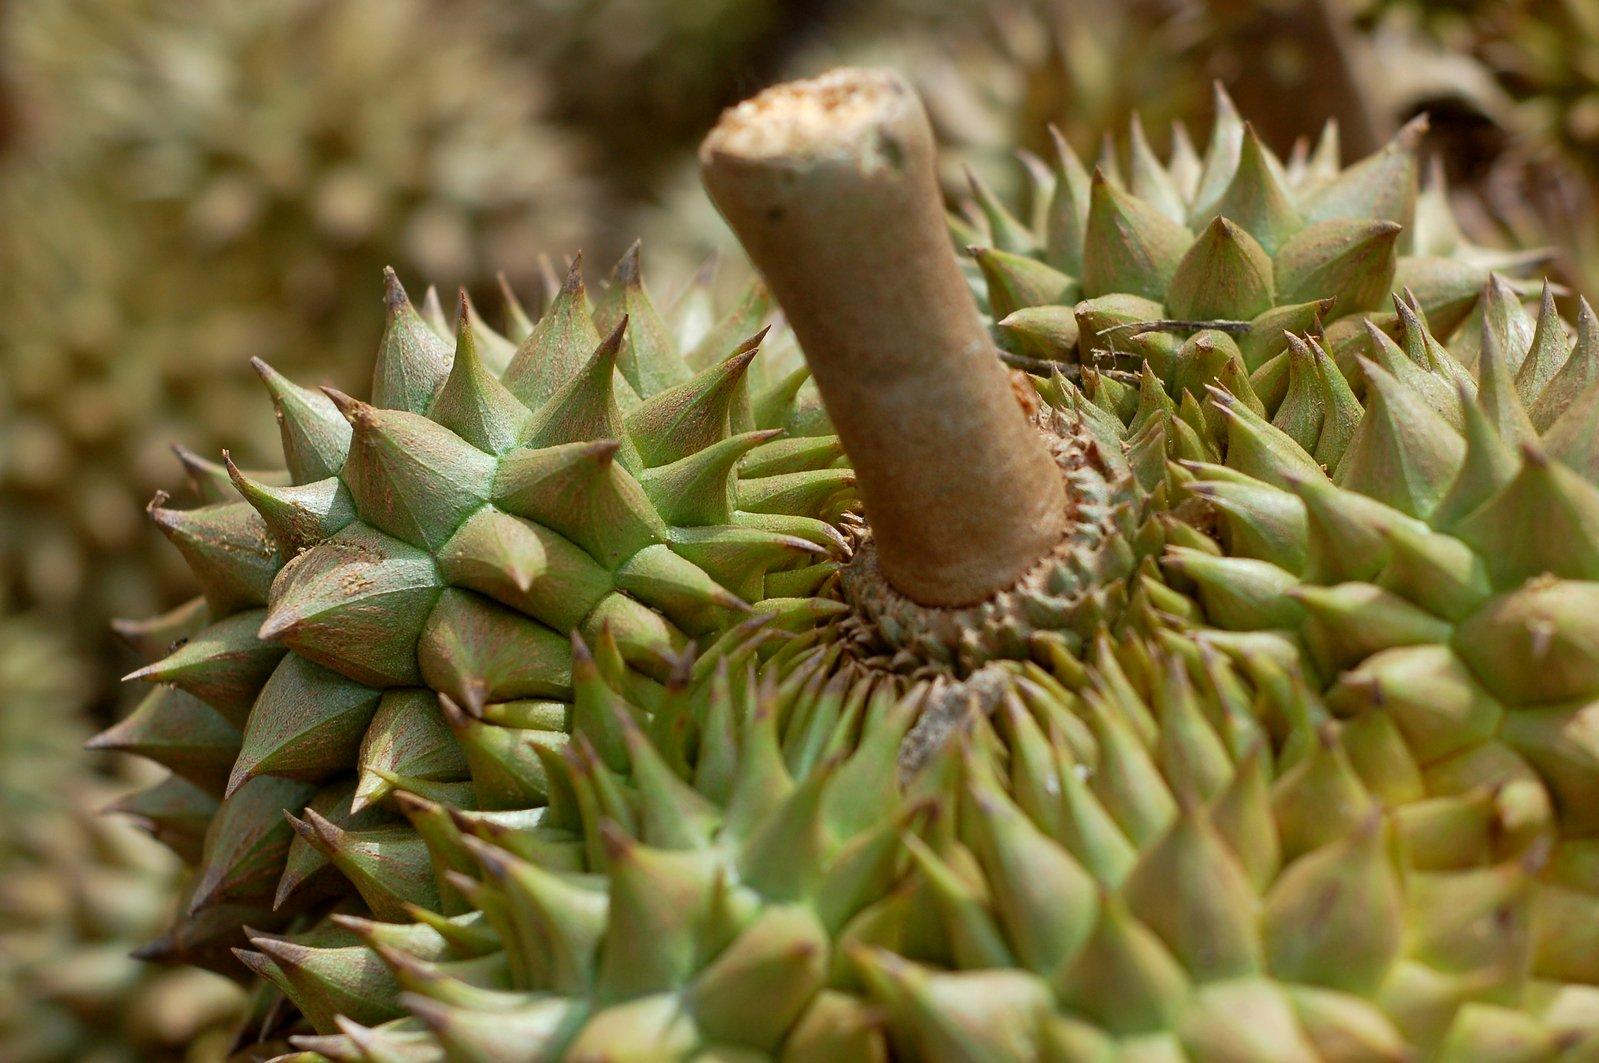 endangered durian